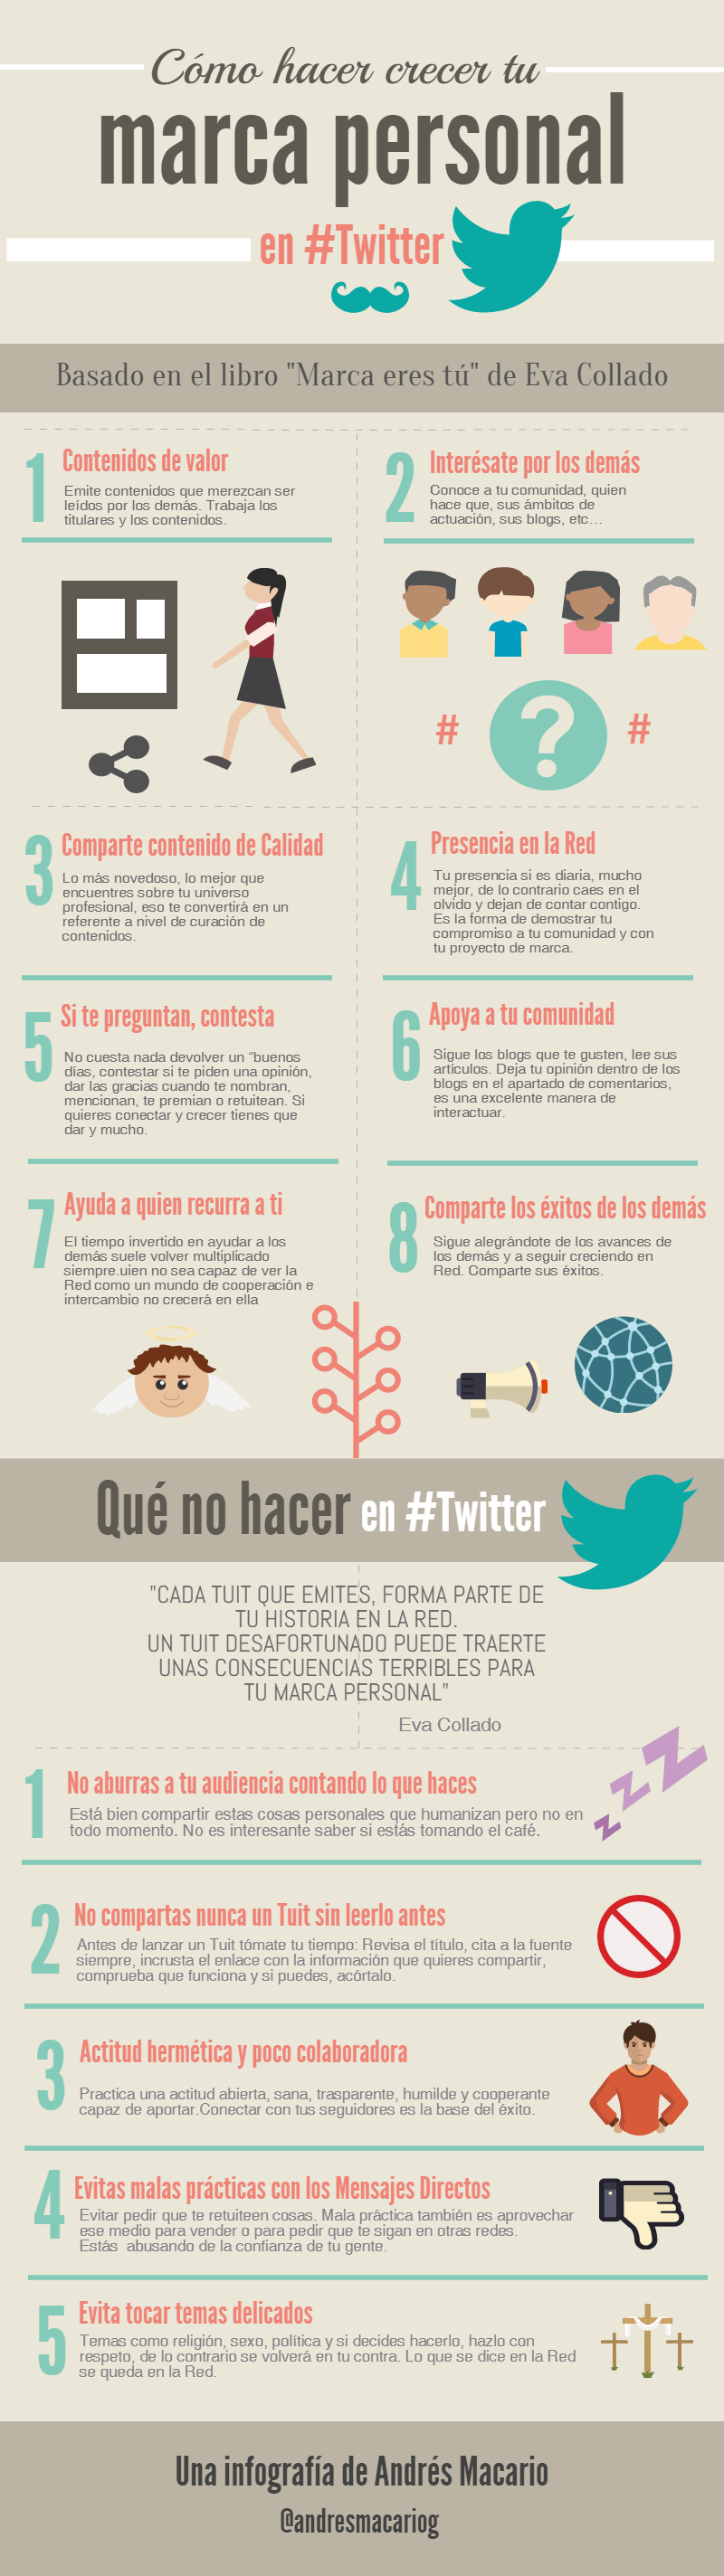 desarrollar-marca-personal-twitter-infografia